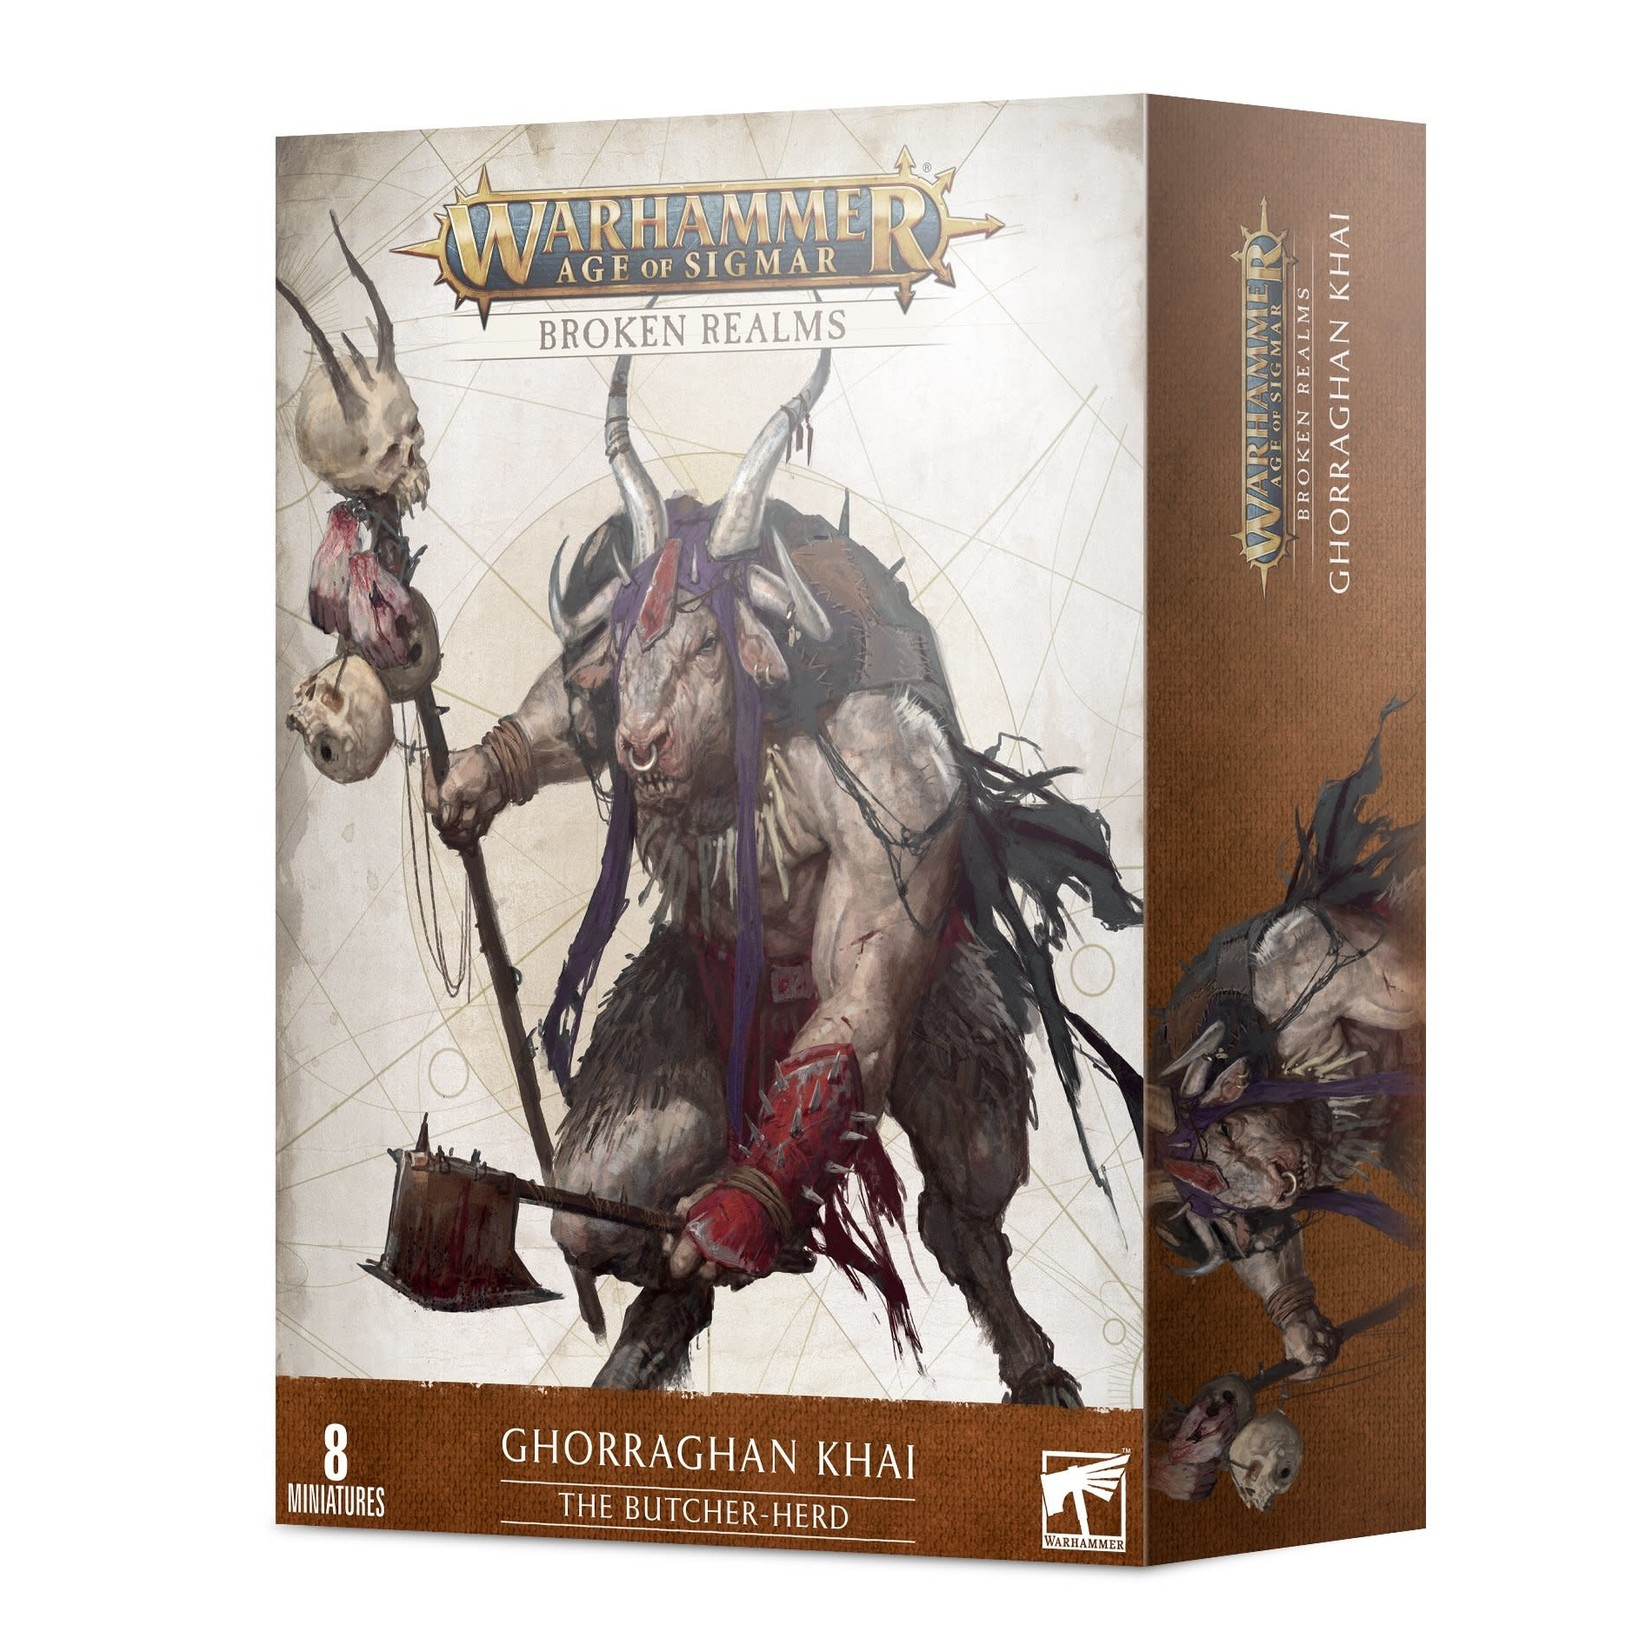 Games Workshop Warhammer Age of Sigmar: Broken Realms - The Butcher-Herd